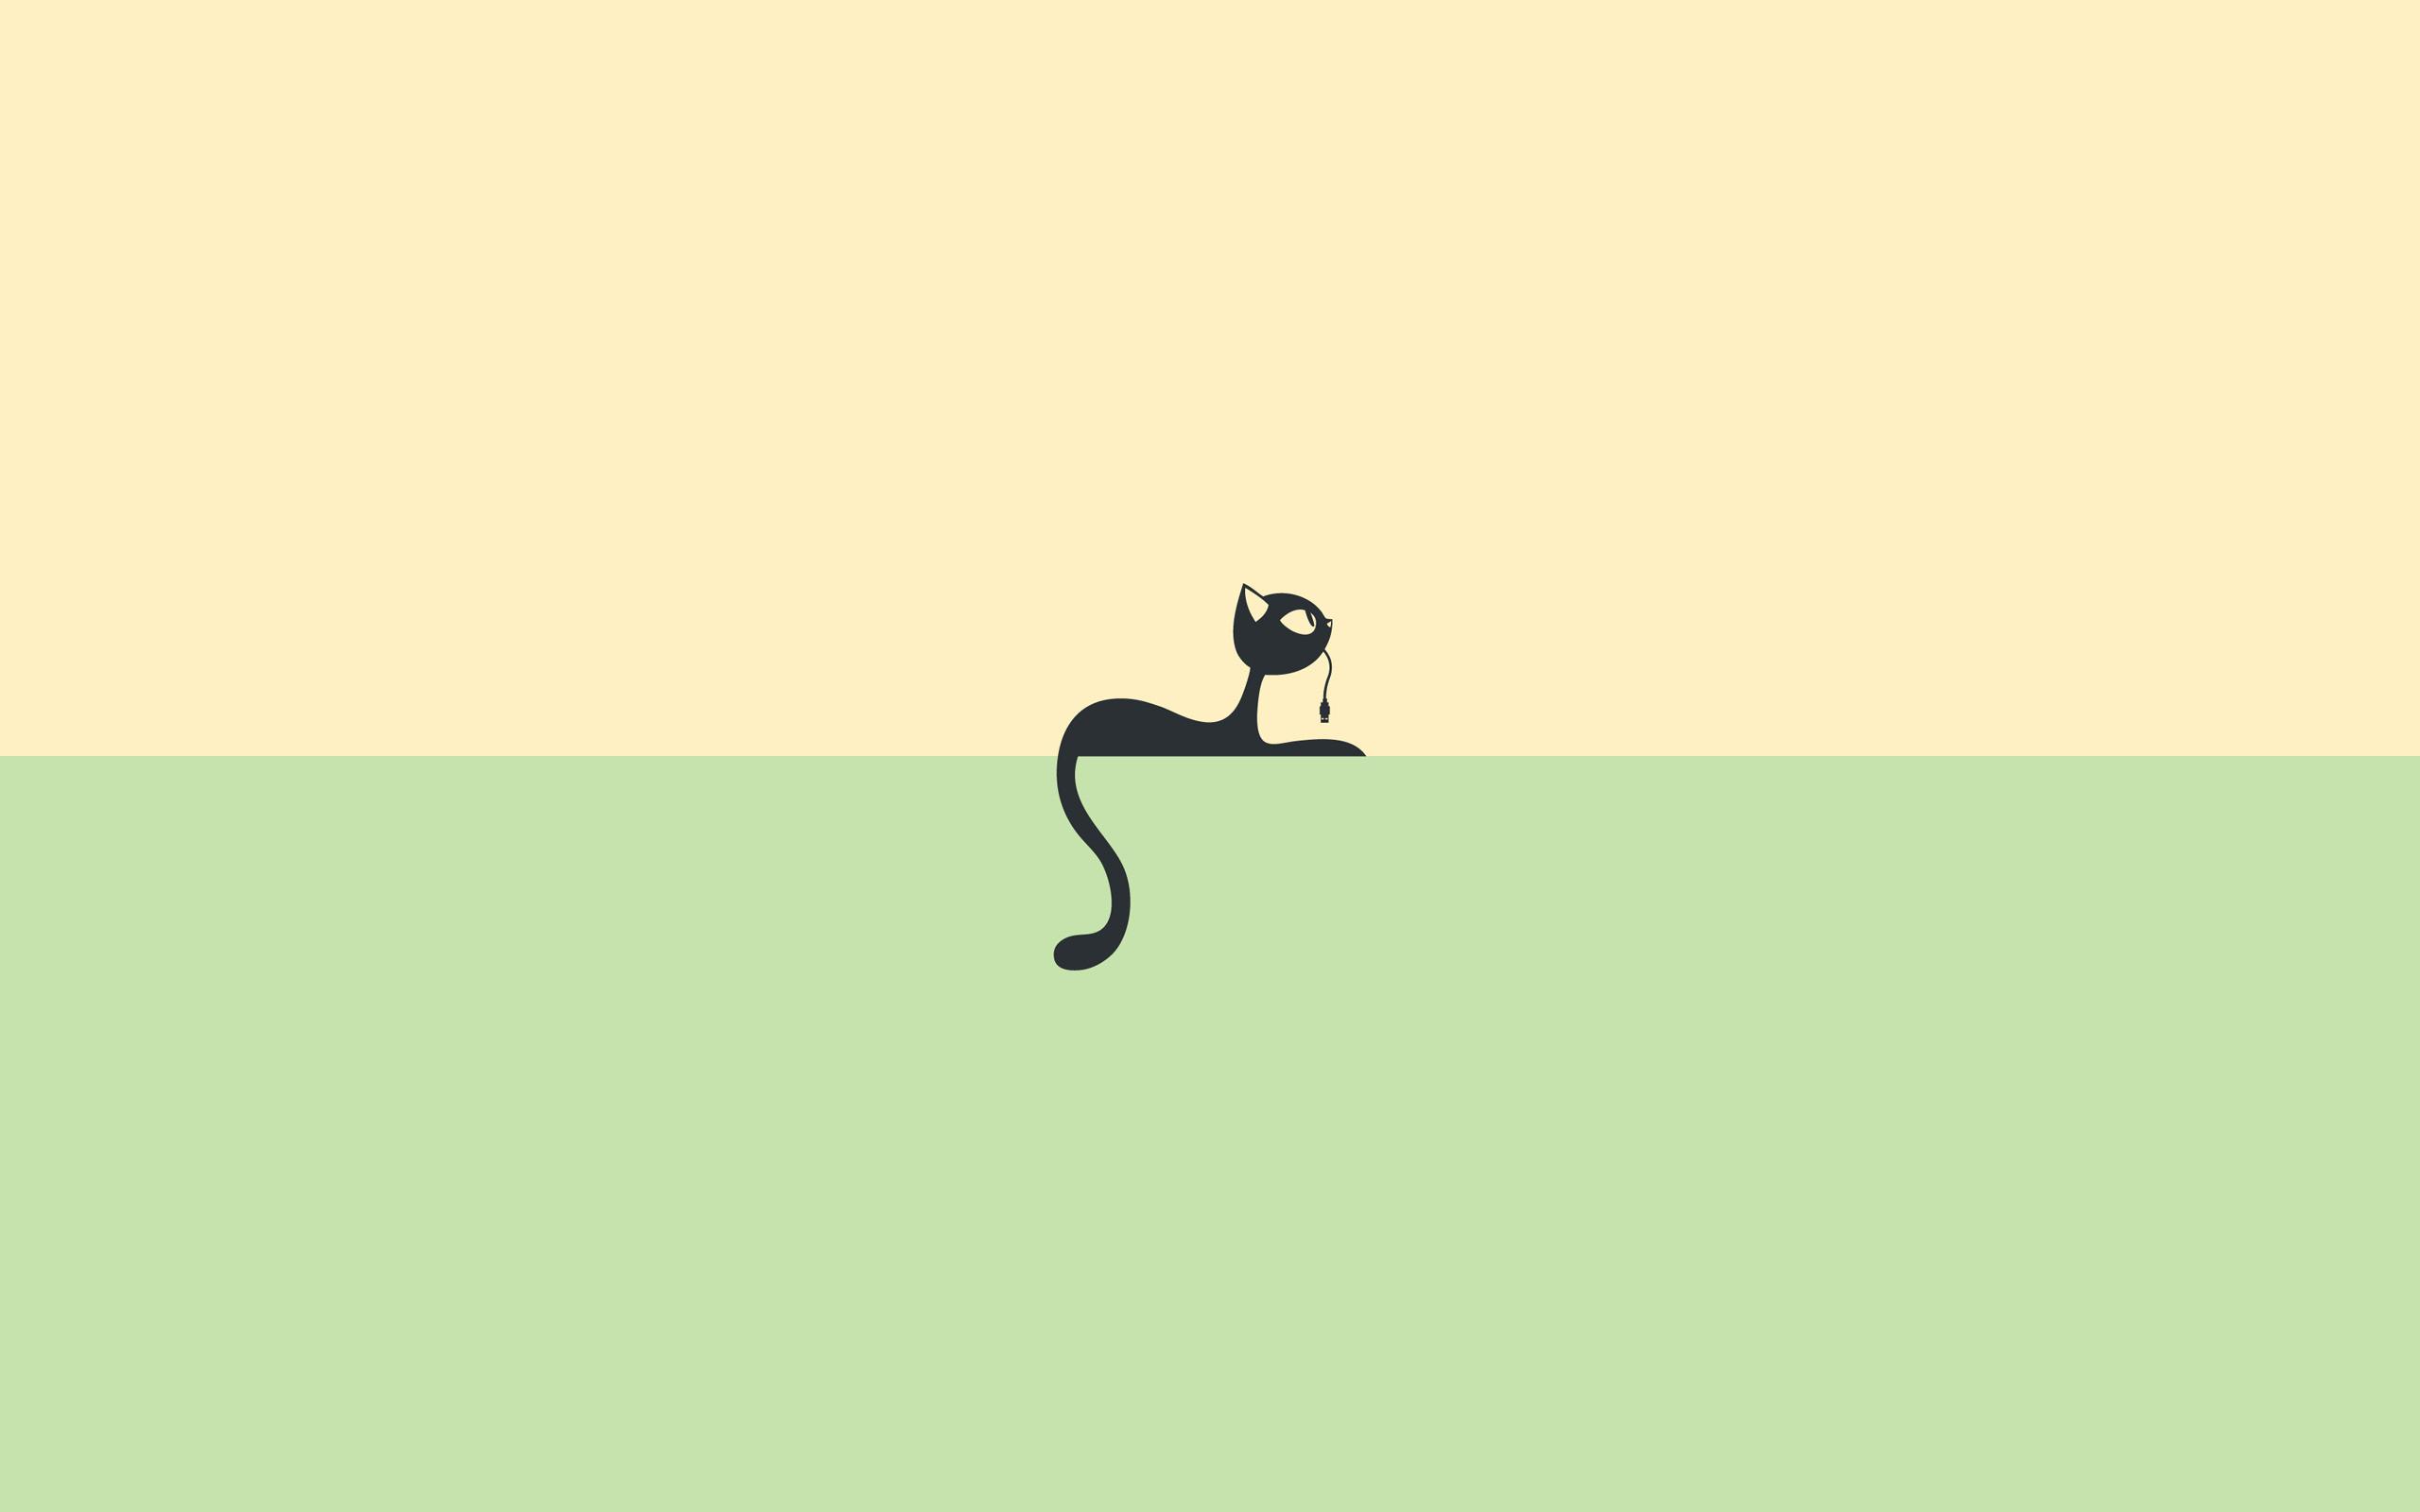 wallpaper.wiki-HD-Cartoon-Cat-Wallpaper-PIC-WPE005451